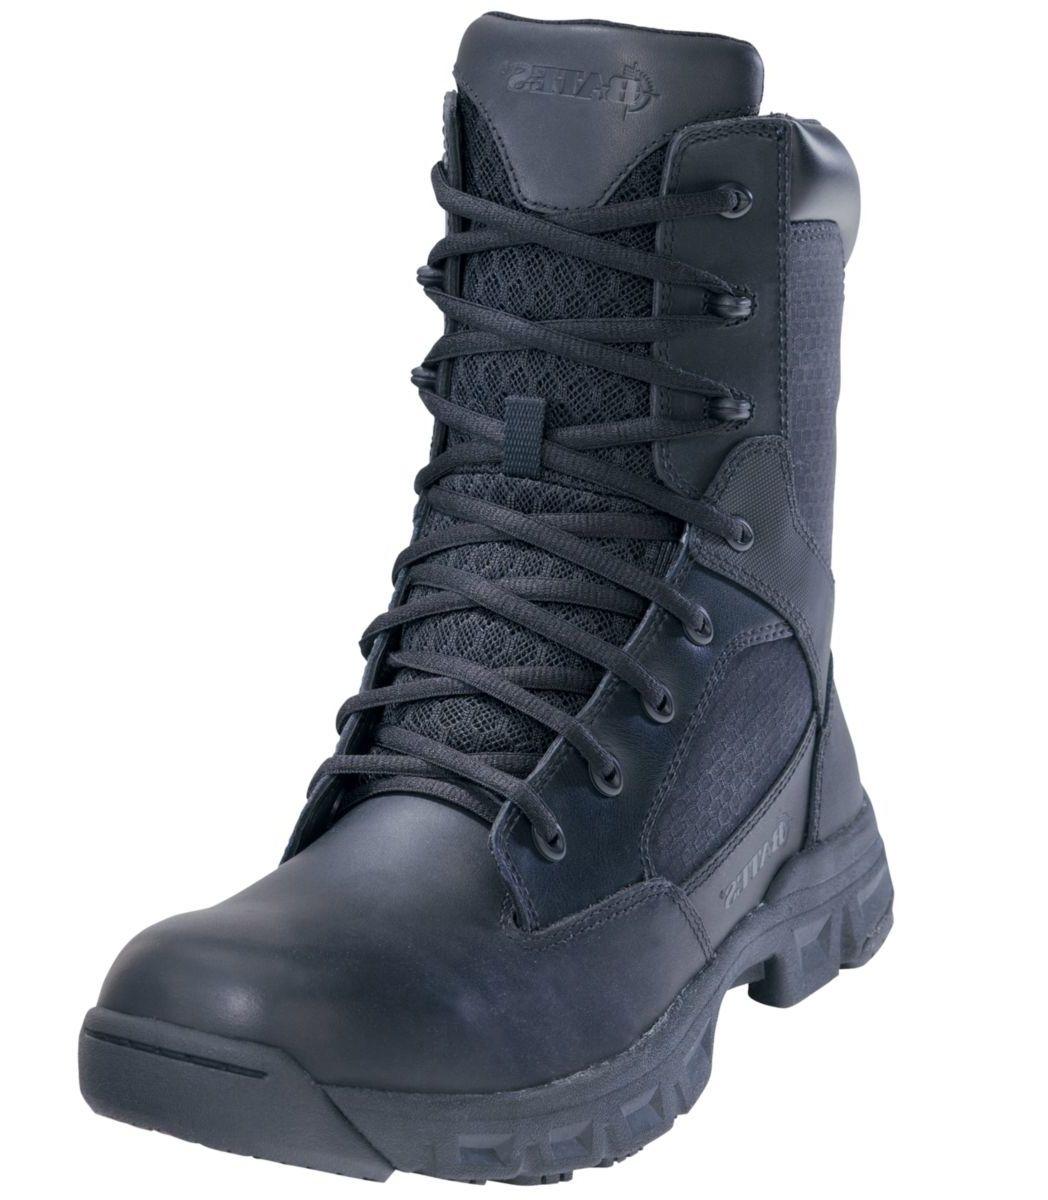 "Bates Men's 8"" Code 6.2 Duty Boots"